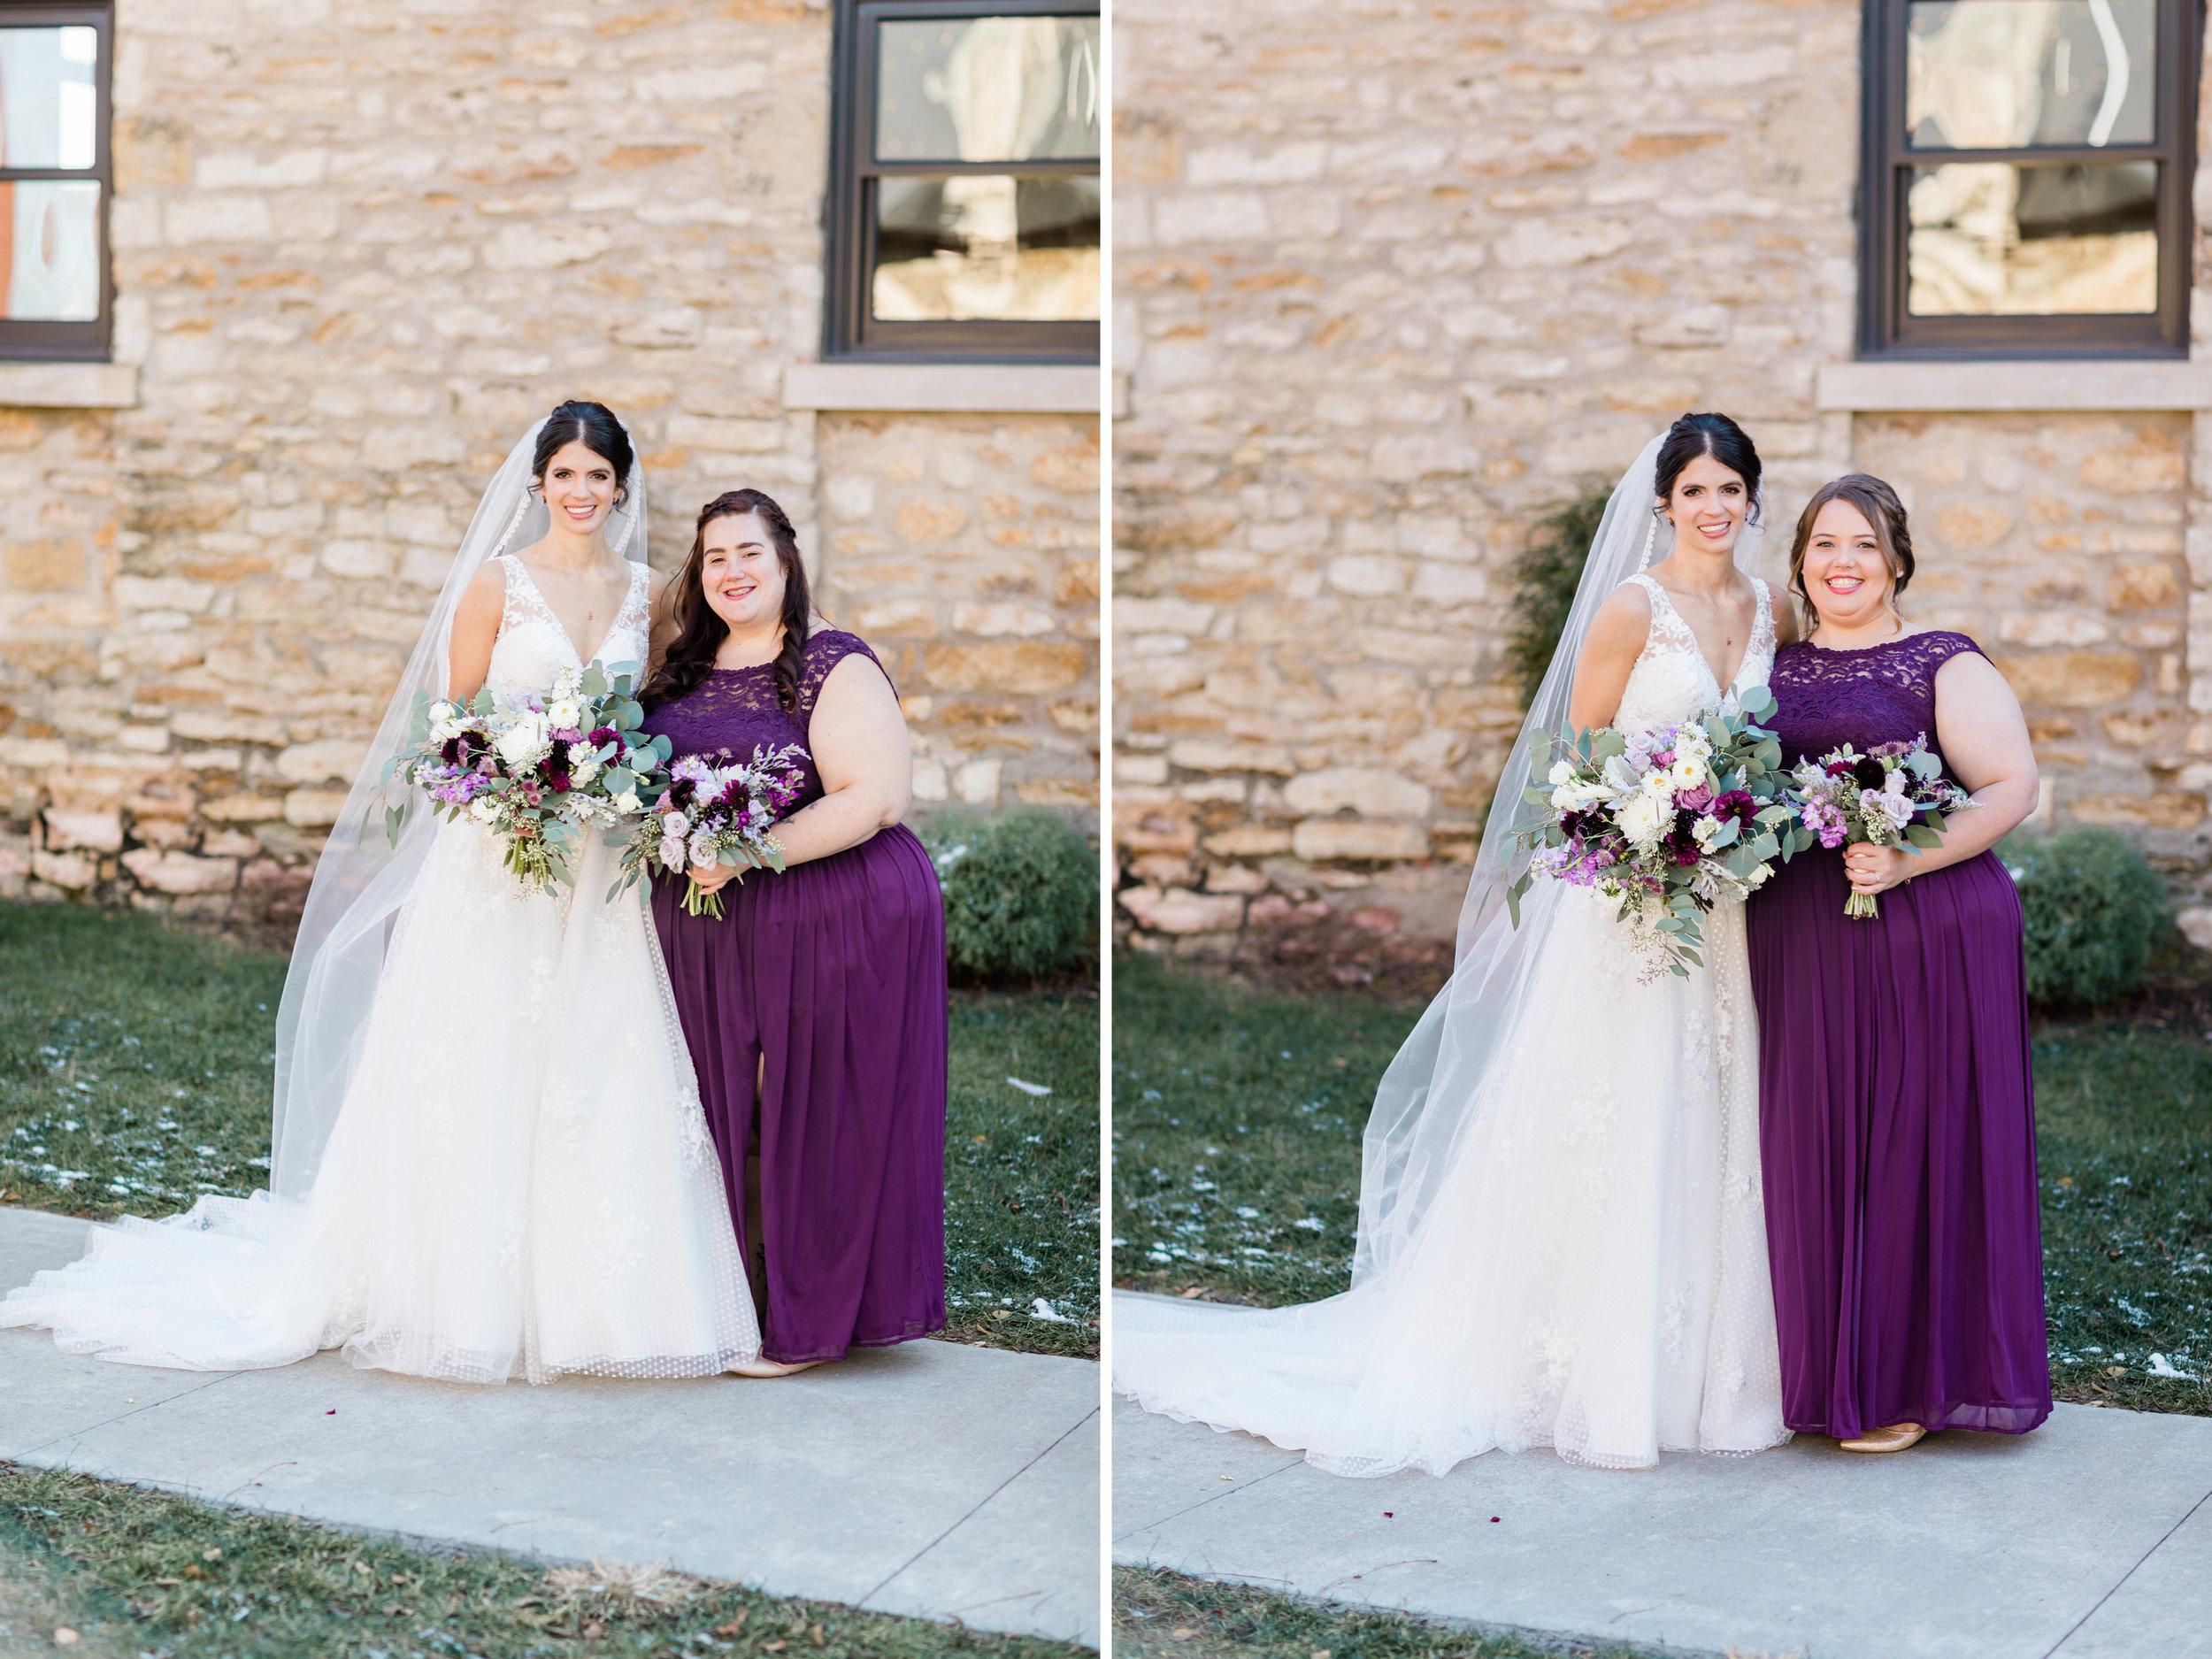 Lawrence Kansas Wedding Cider Gallery 13.jpg